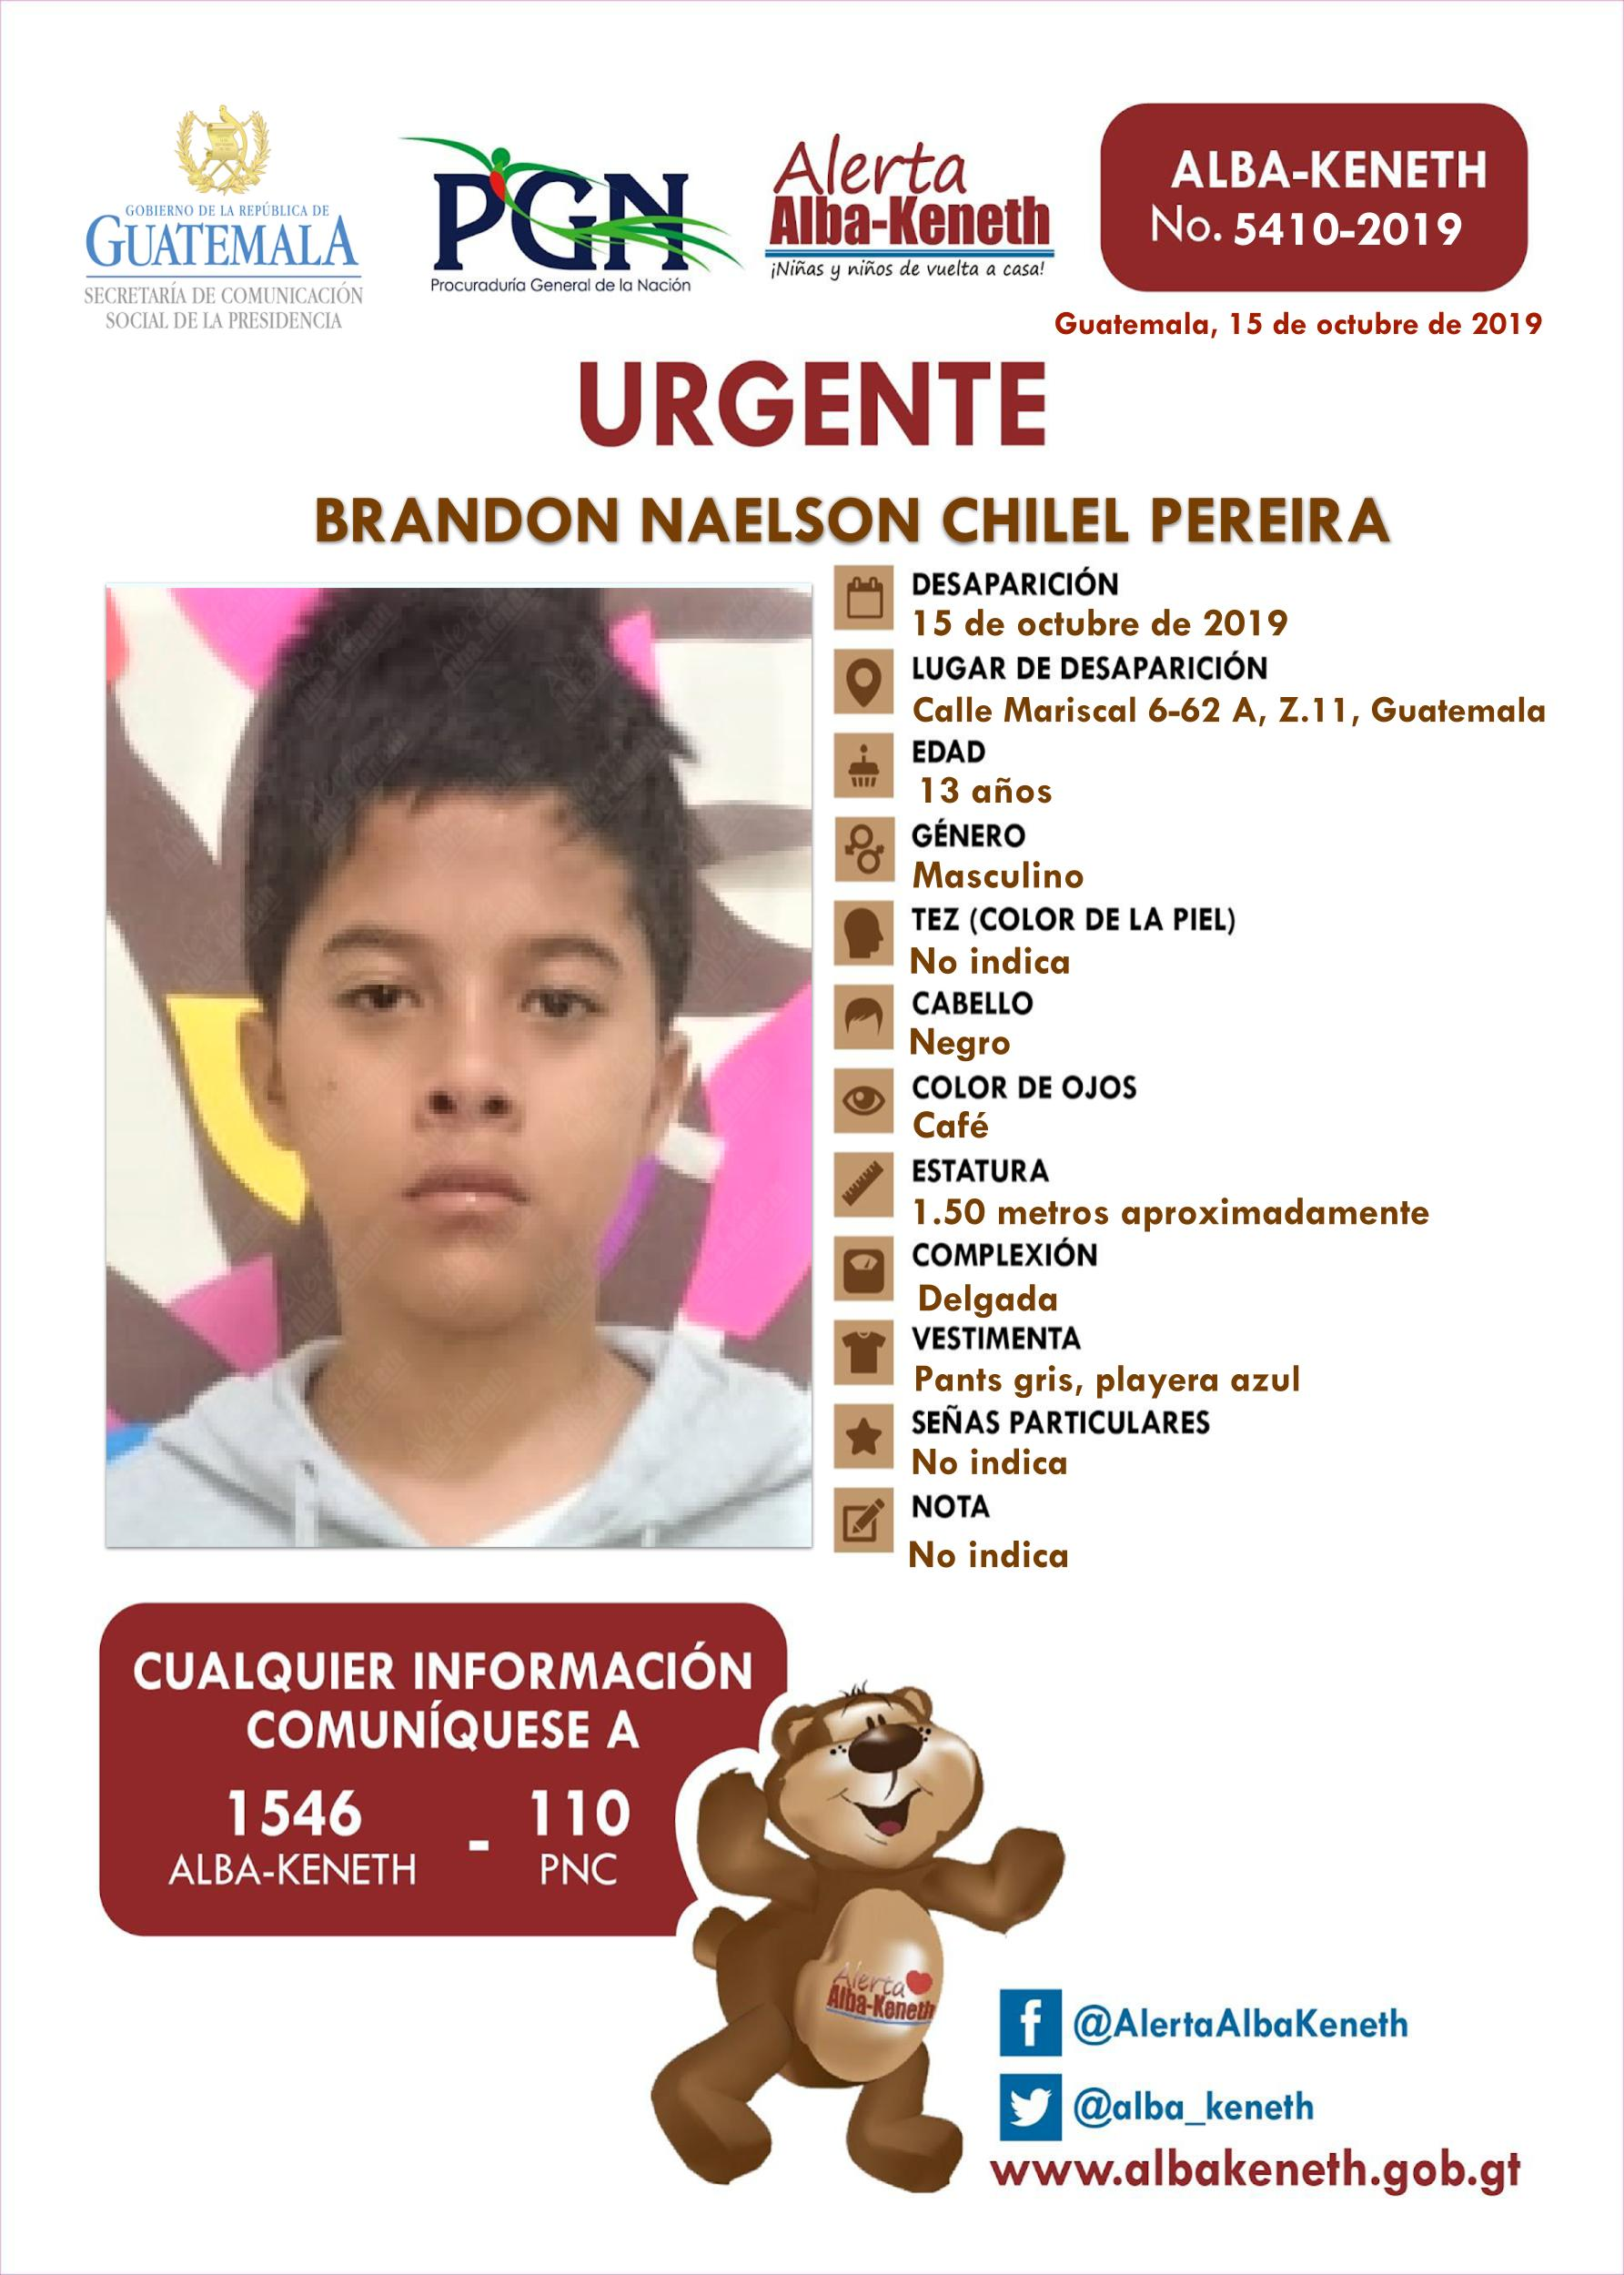 Brandon Naelson Chilel Pereira